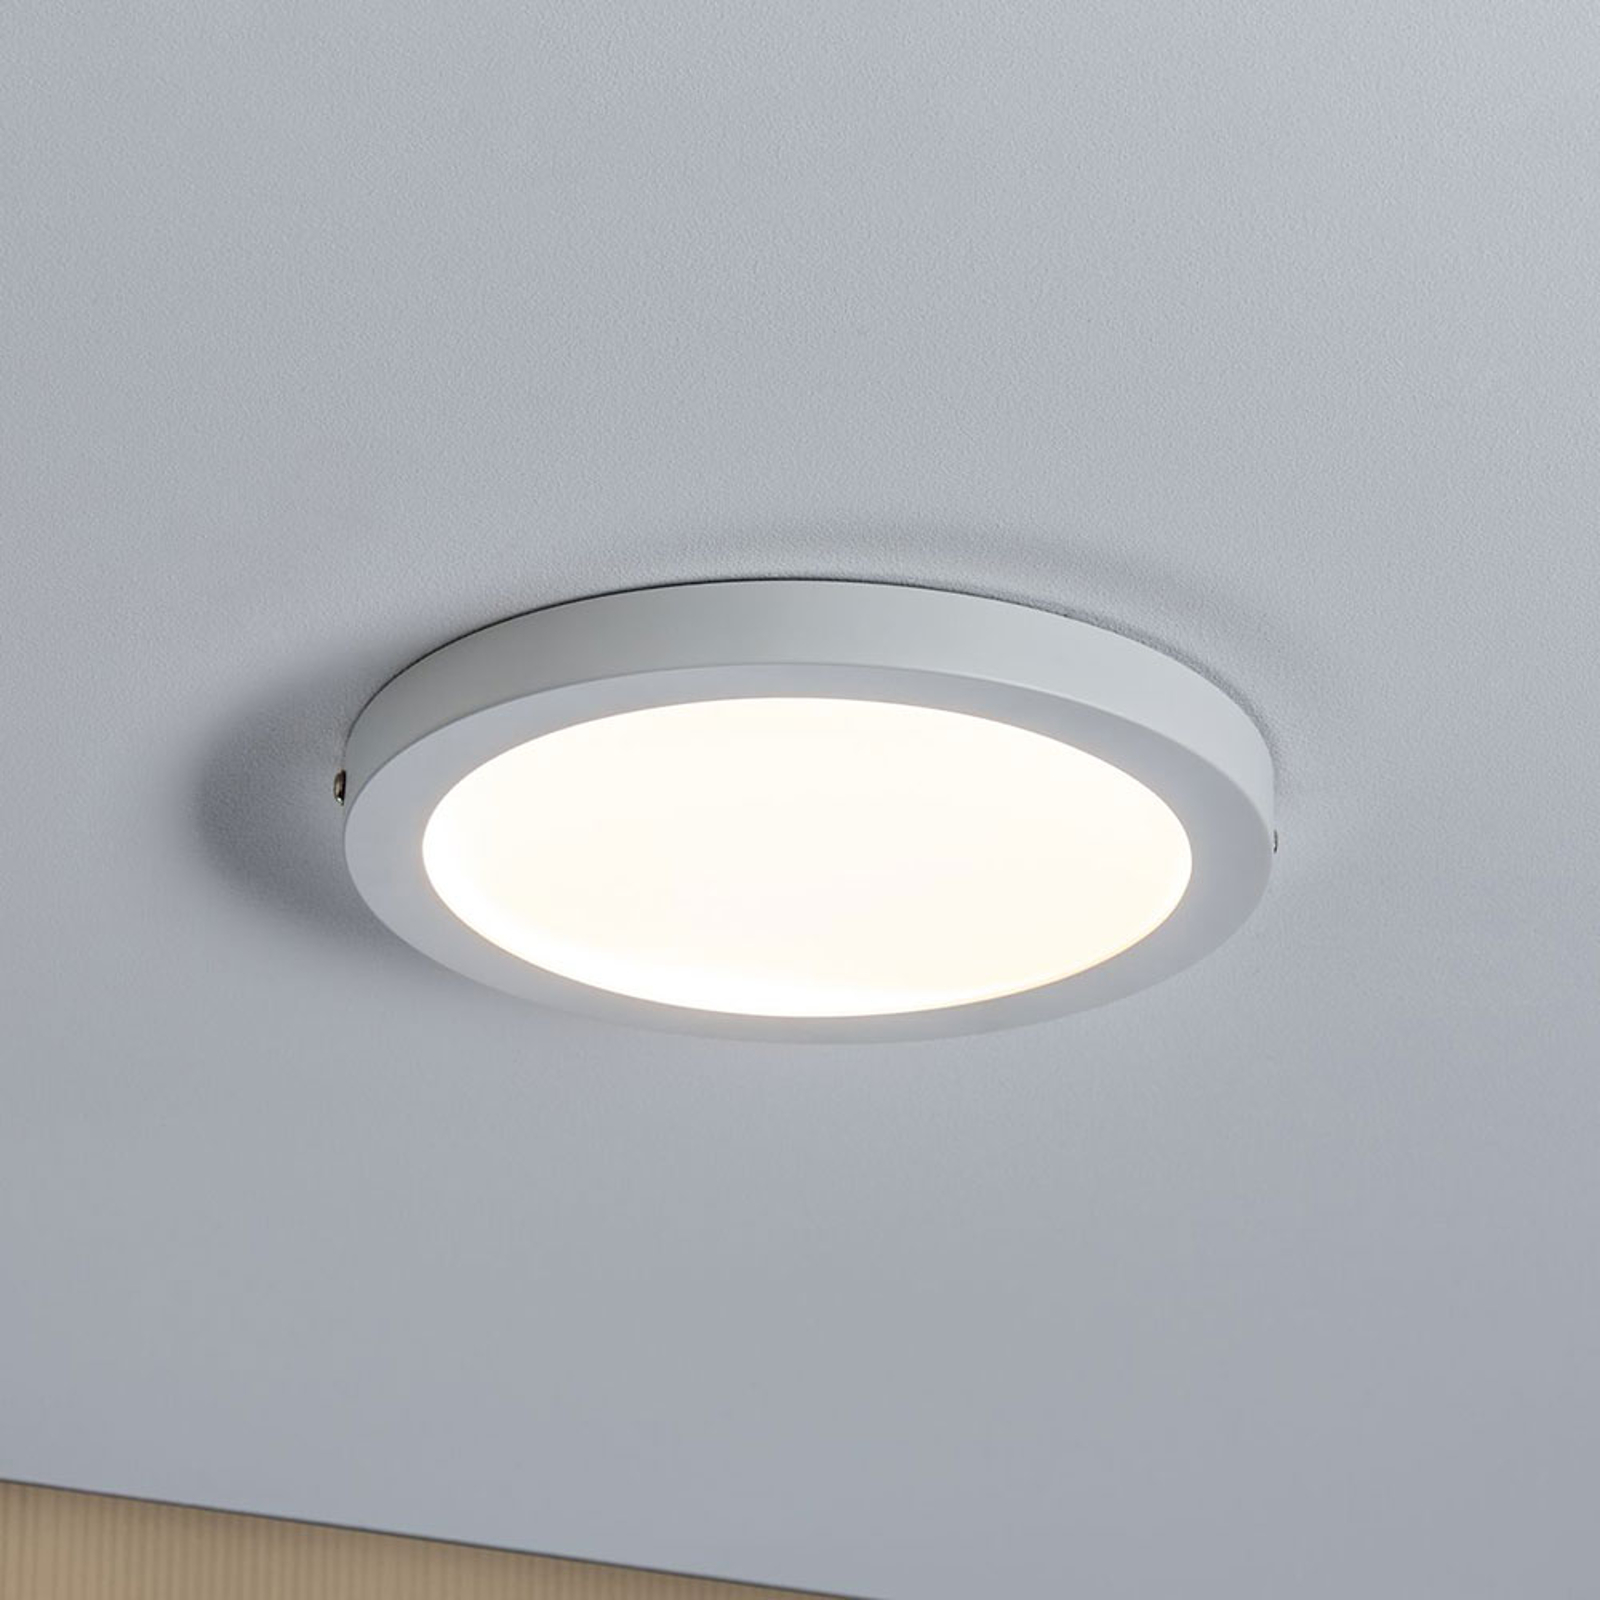 Paulmann Atria plafoniera LED Ø22cm bianco satin. Illuminazione per interni